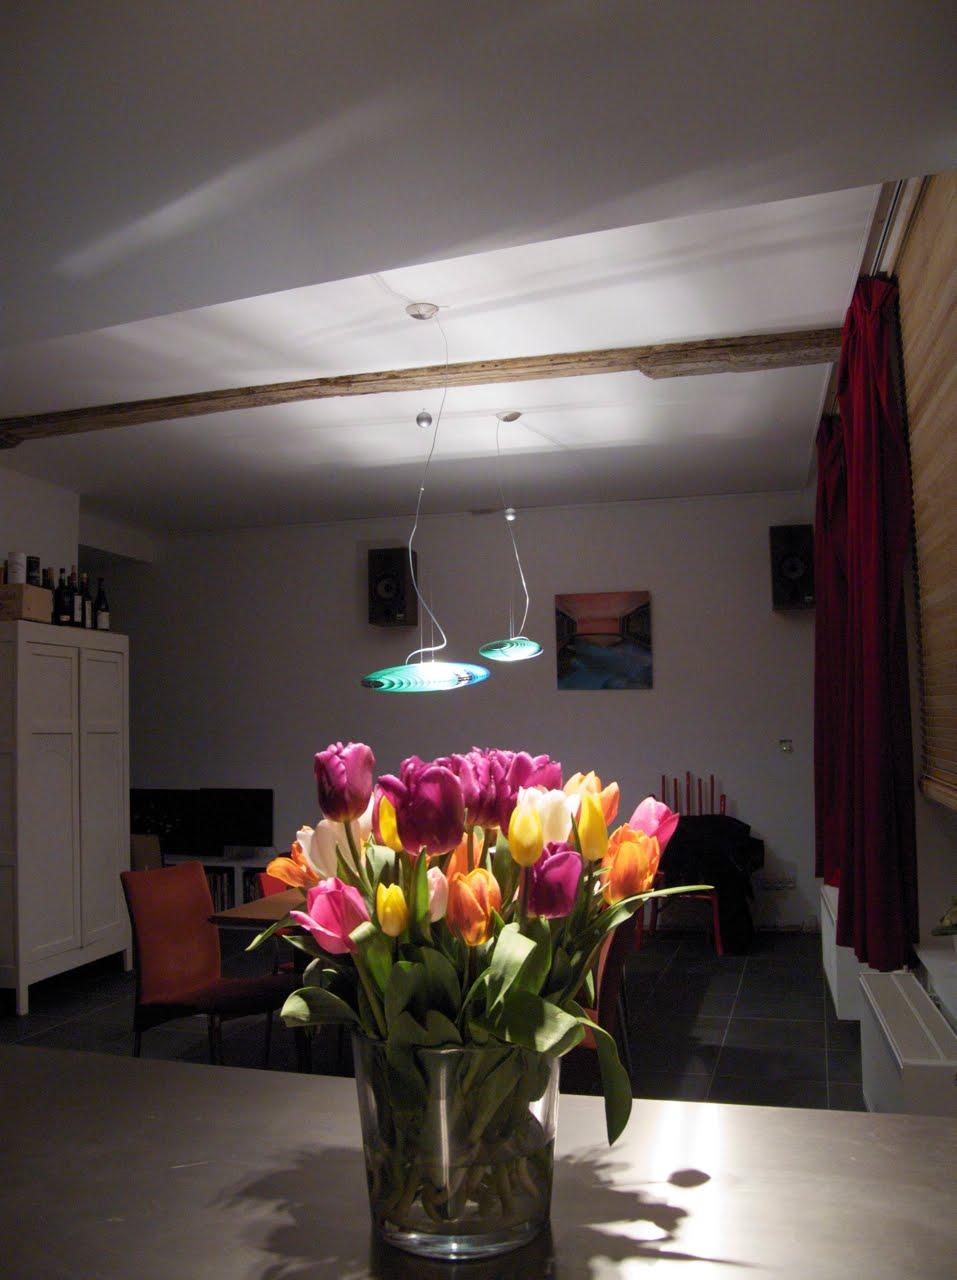 renoveren restaureren verlichting luceplan titania x 2. Black Bedroom Furniture Sets. Home Design Ideas